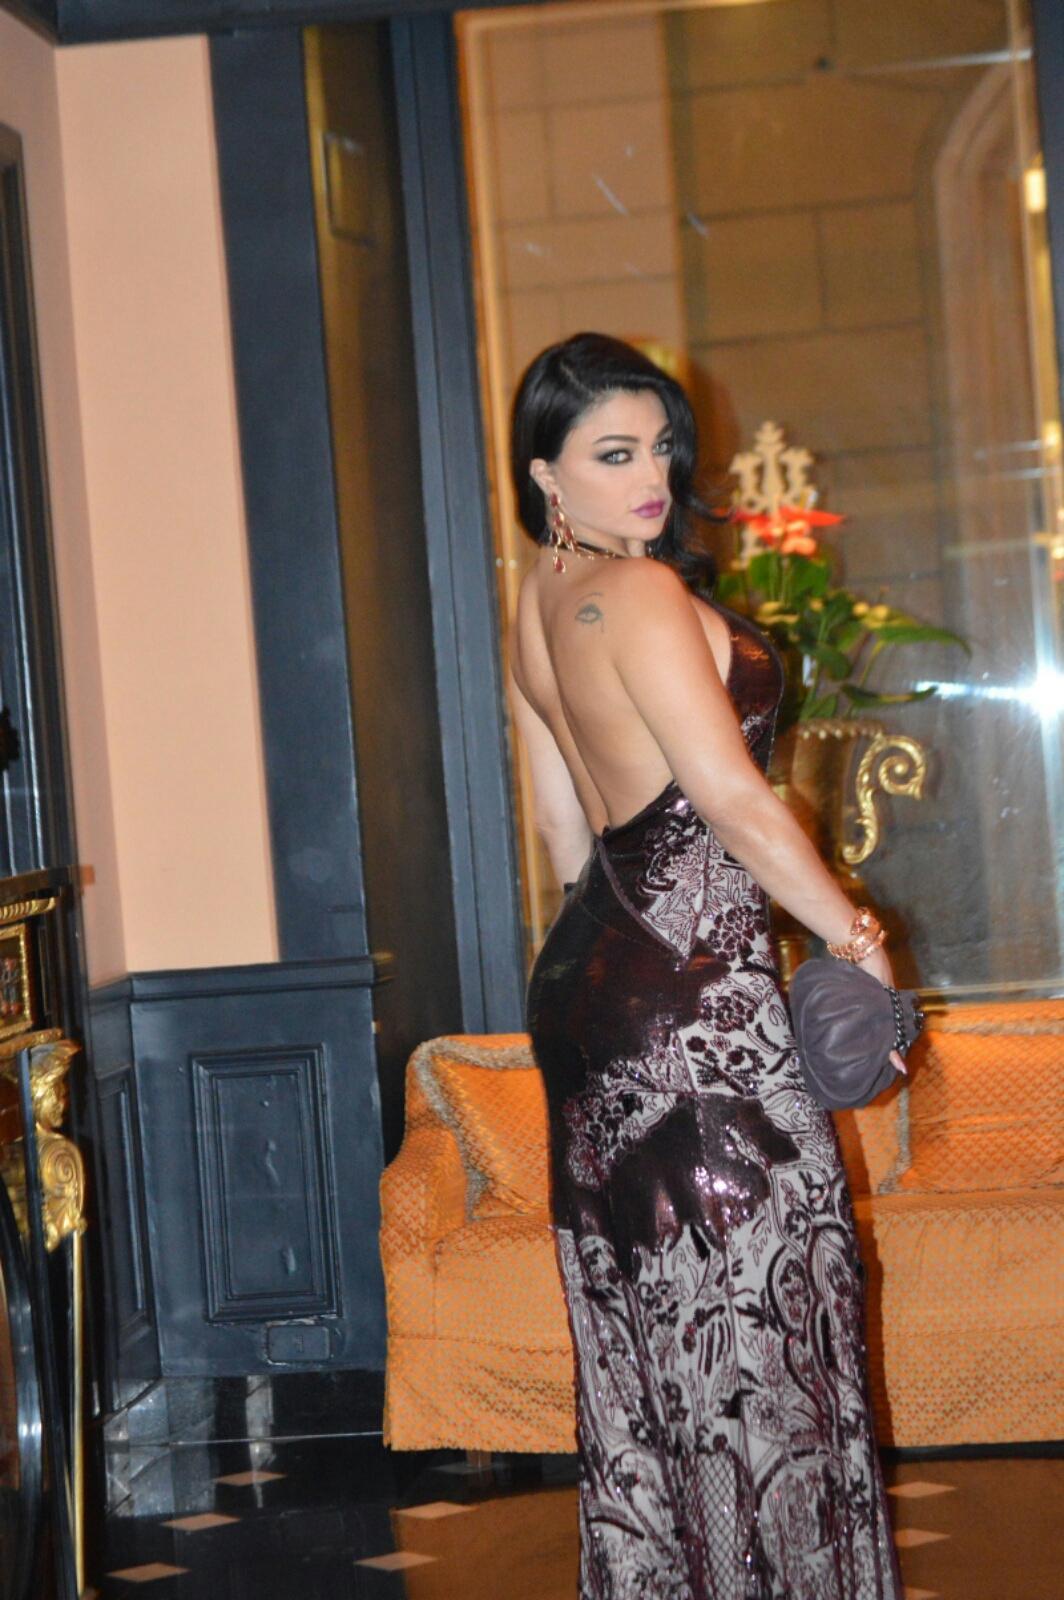 Haifa Wehbe Fashion And Jewelry Haifa Wehbe In Rome For